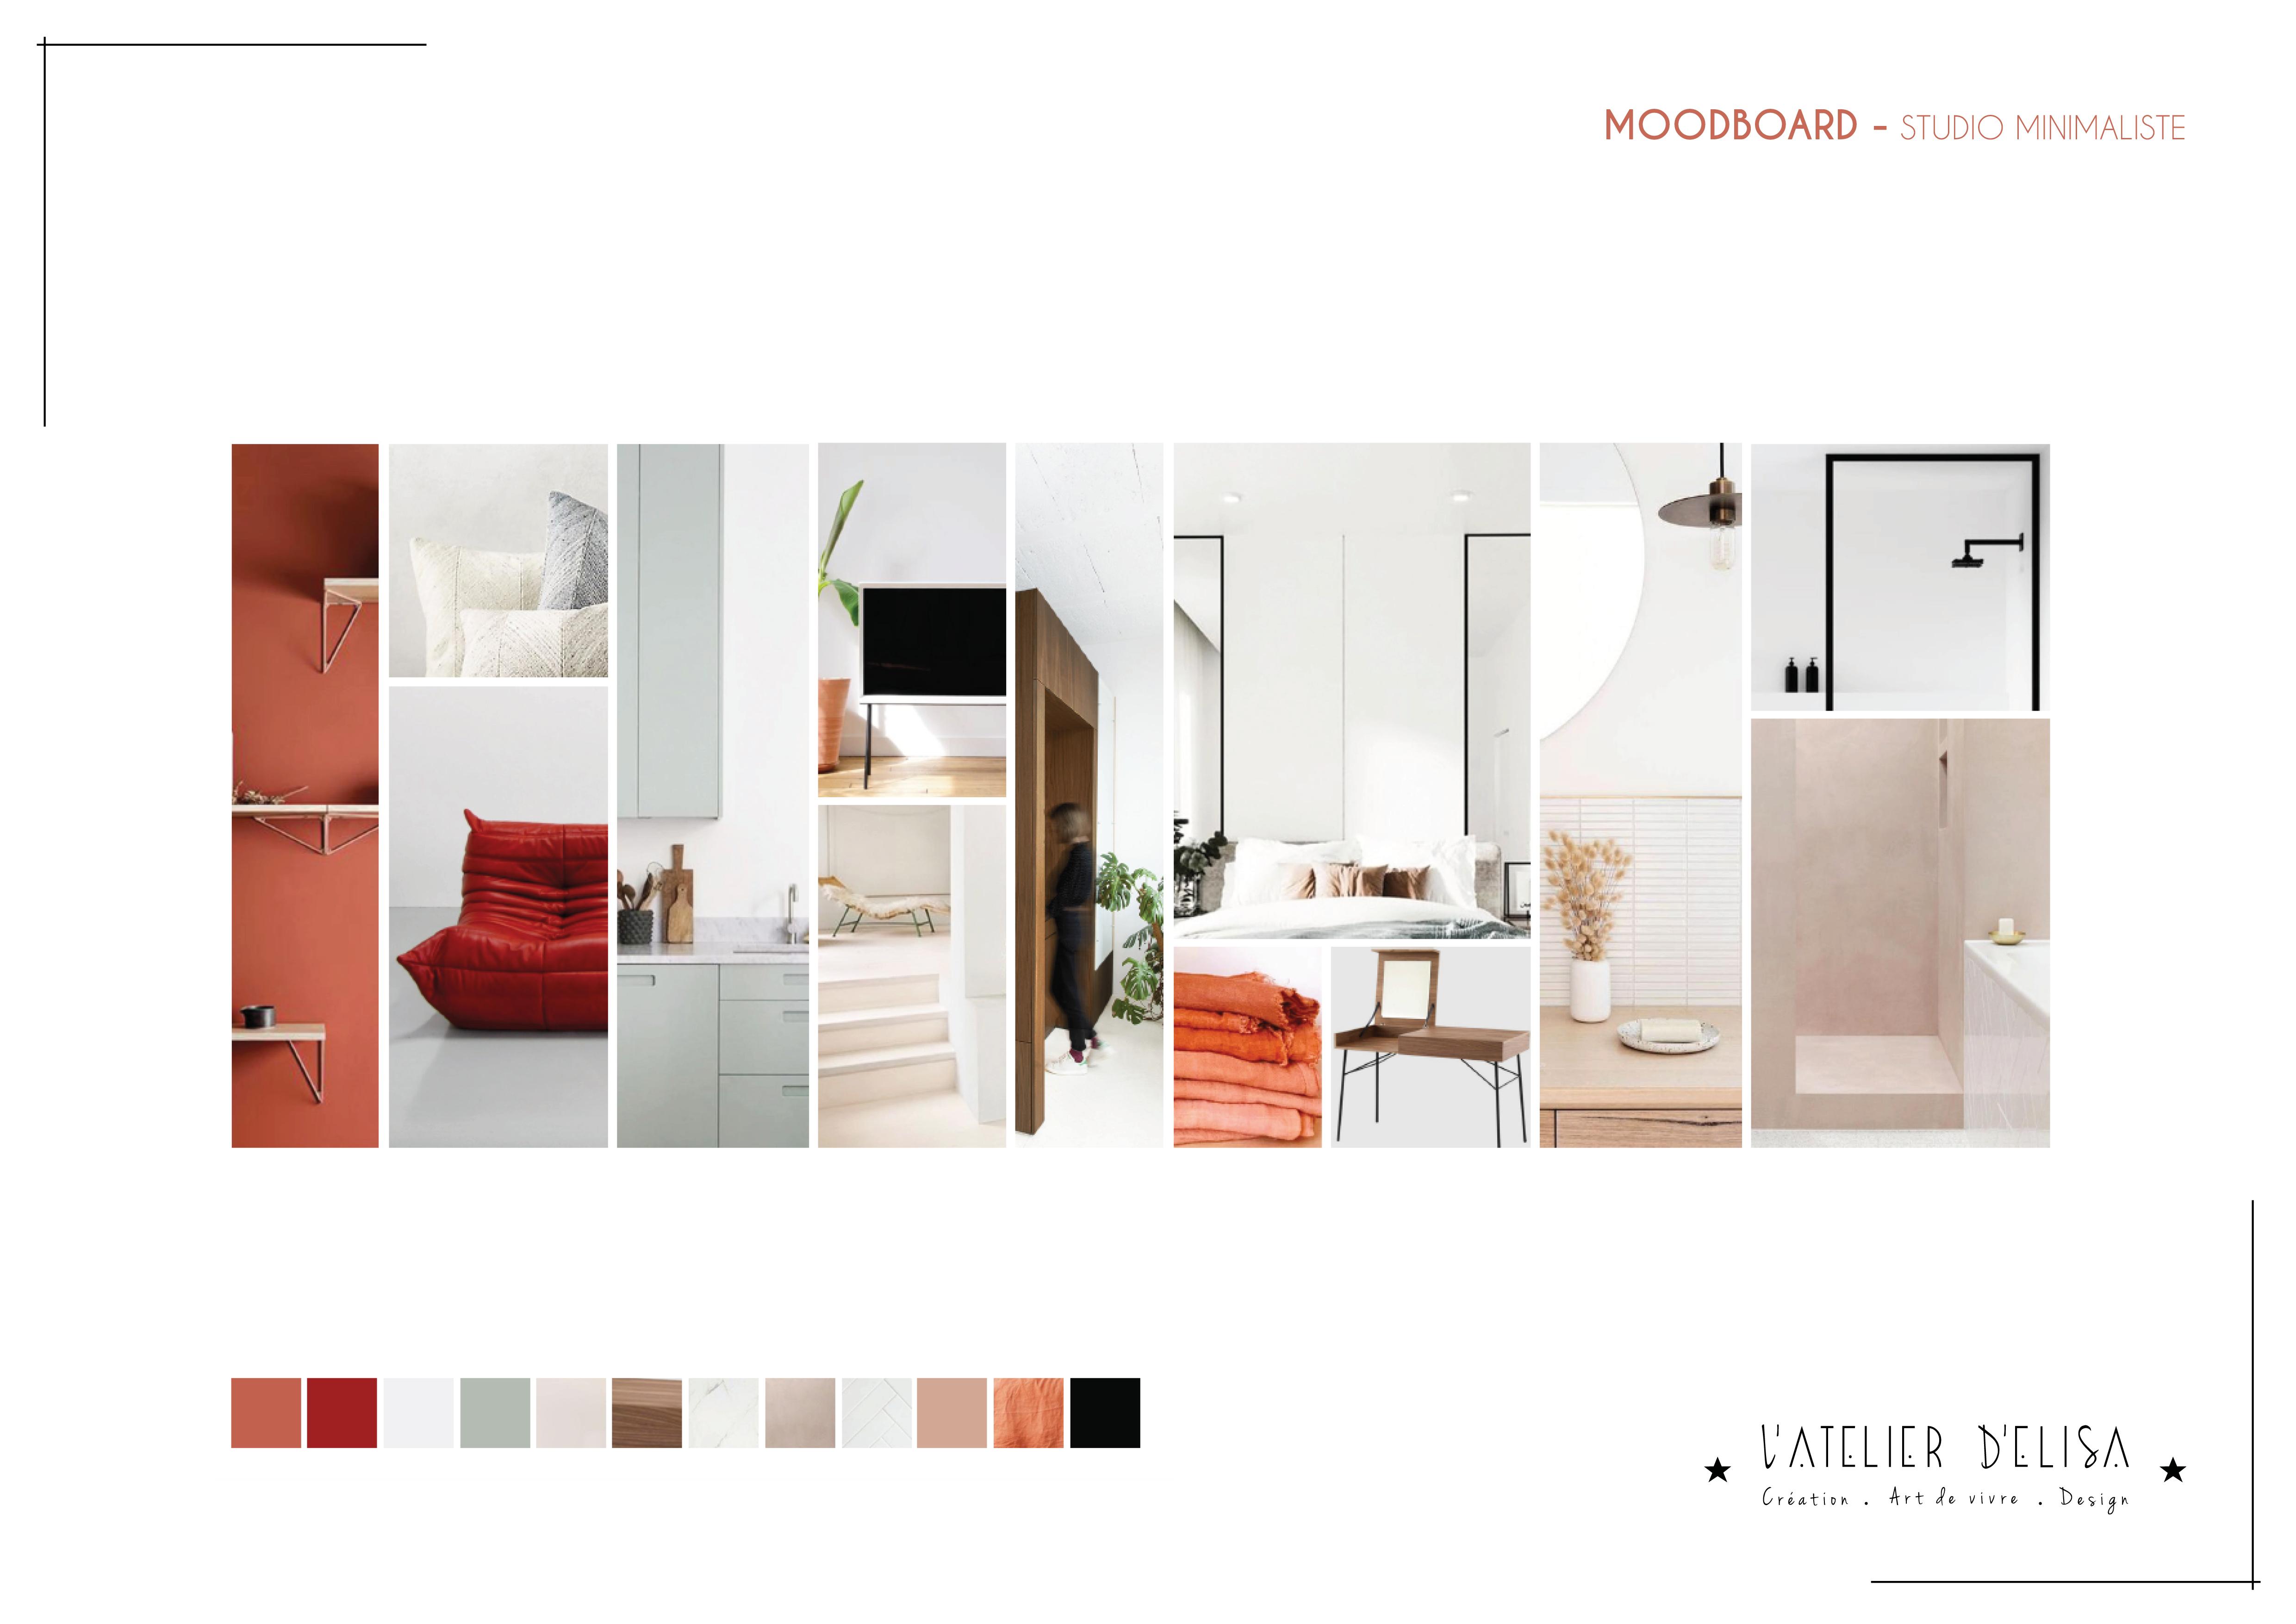 MOODBOARD - STUDIO MINIMALISTE